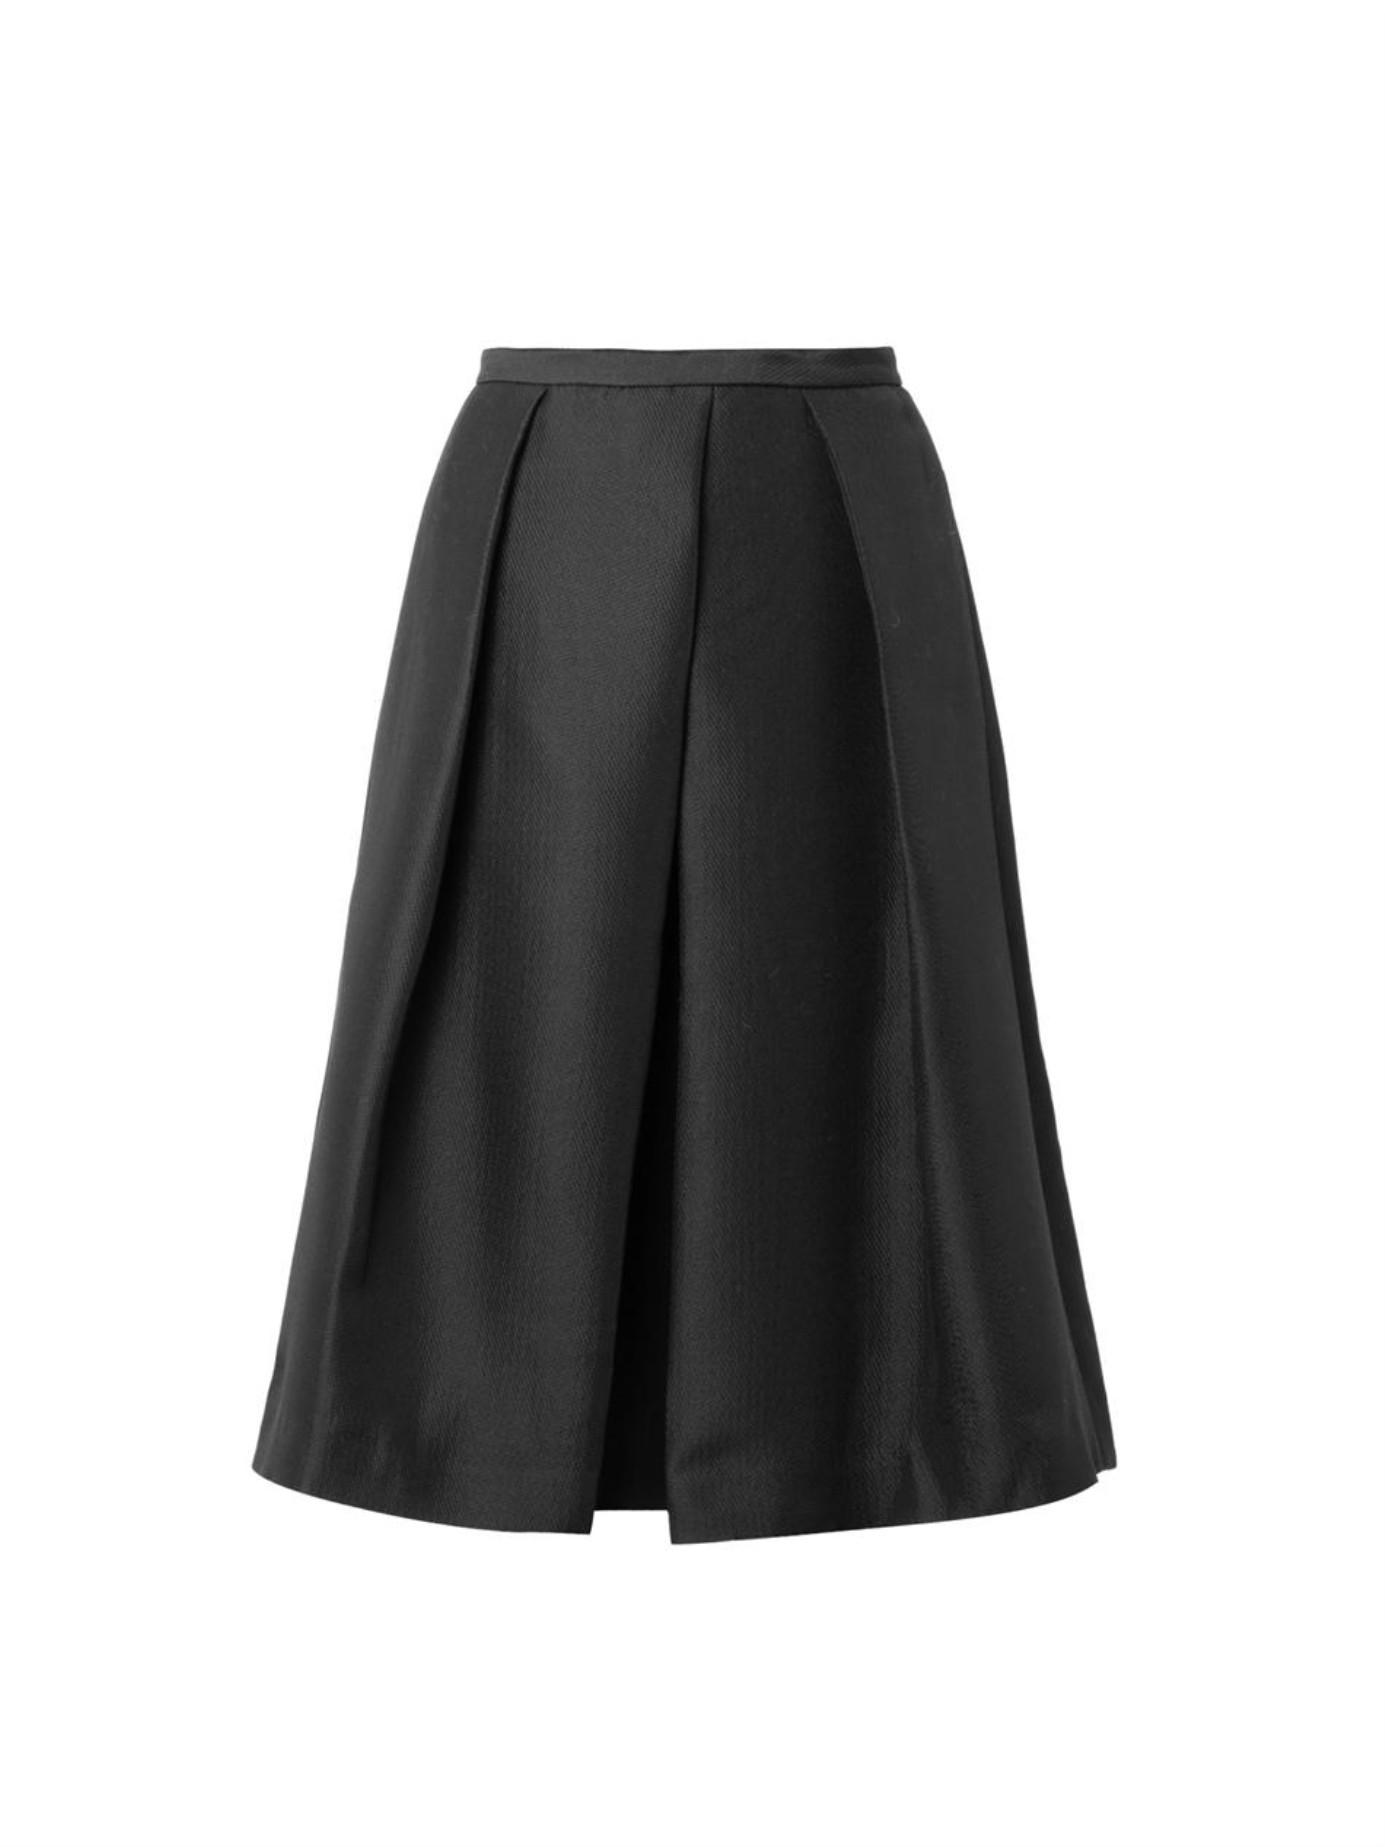 tibi simona jacquard midi skirt in black lyst